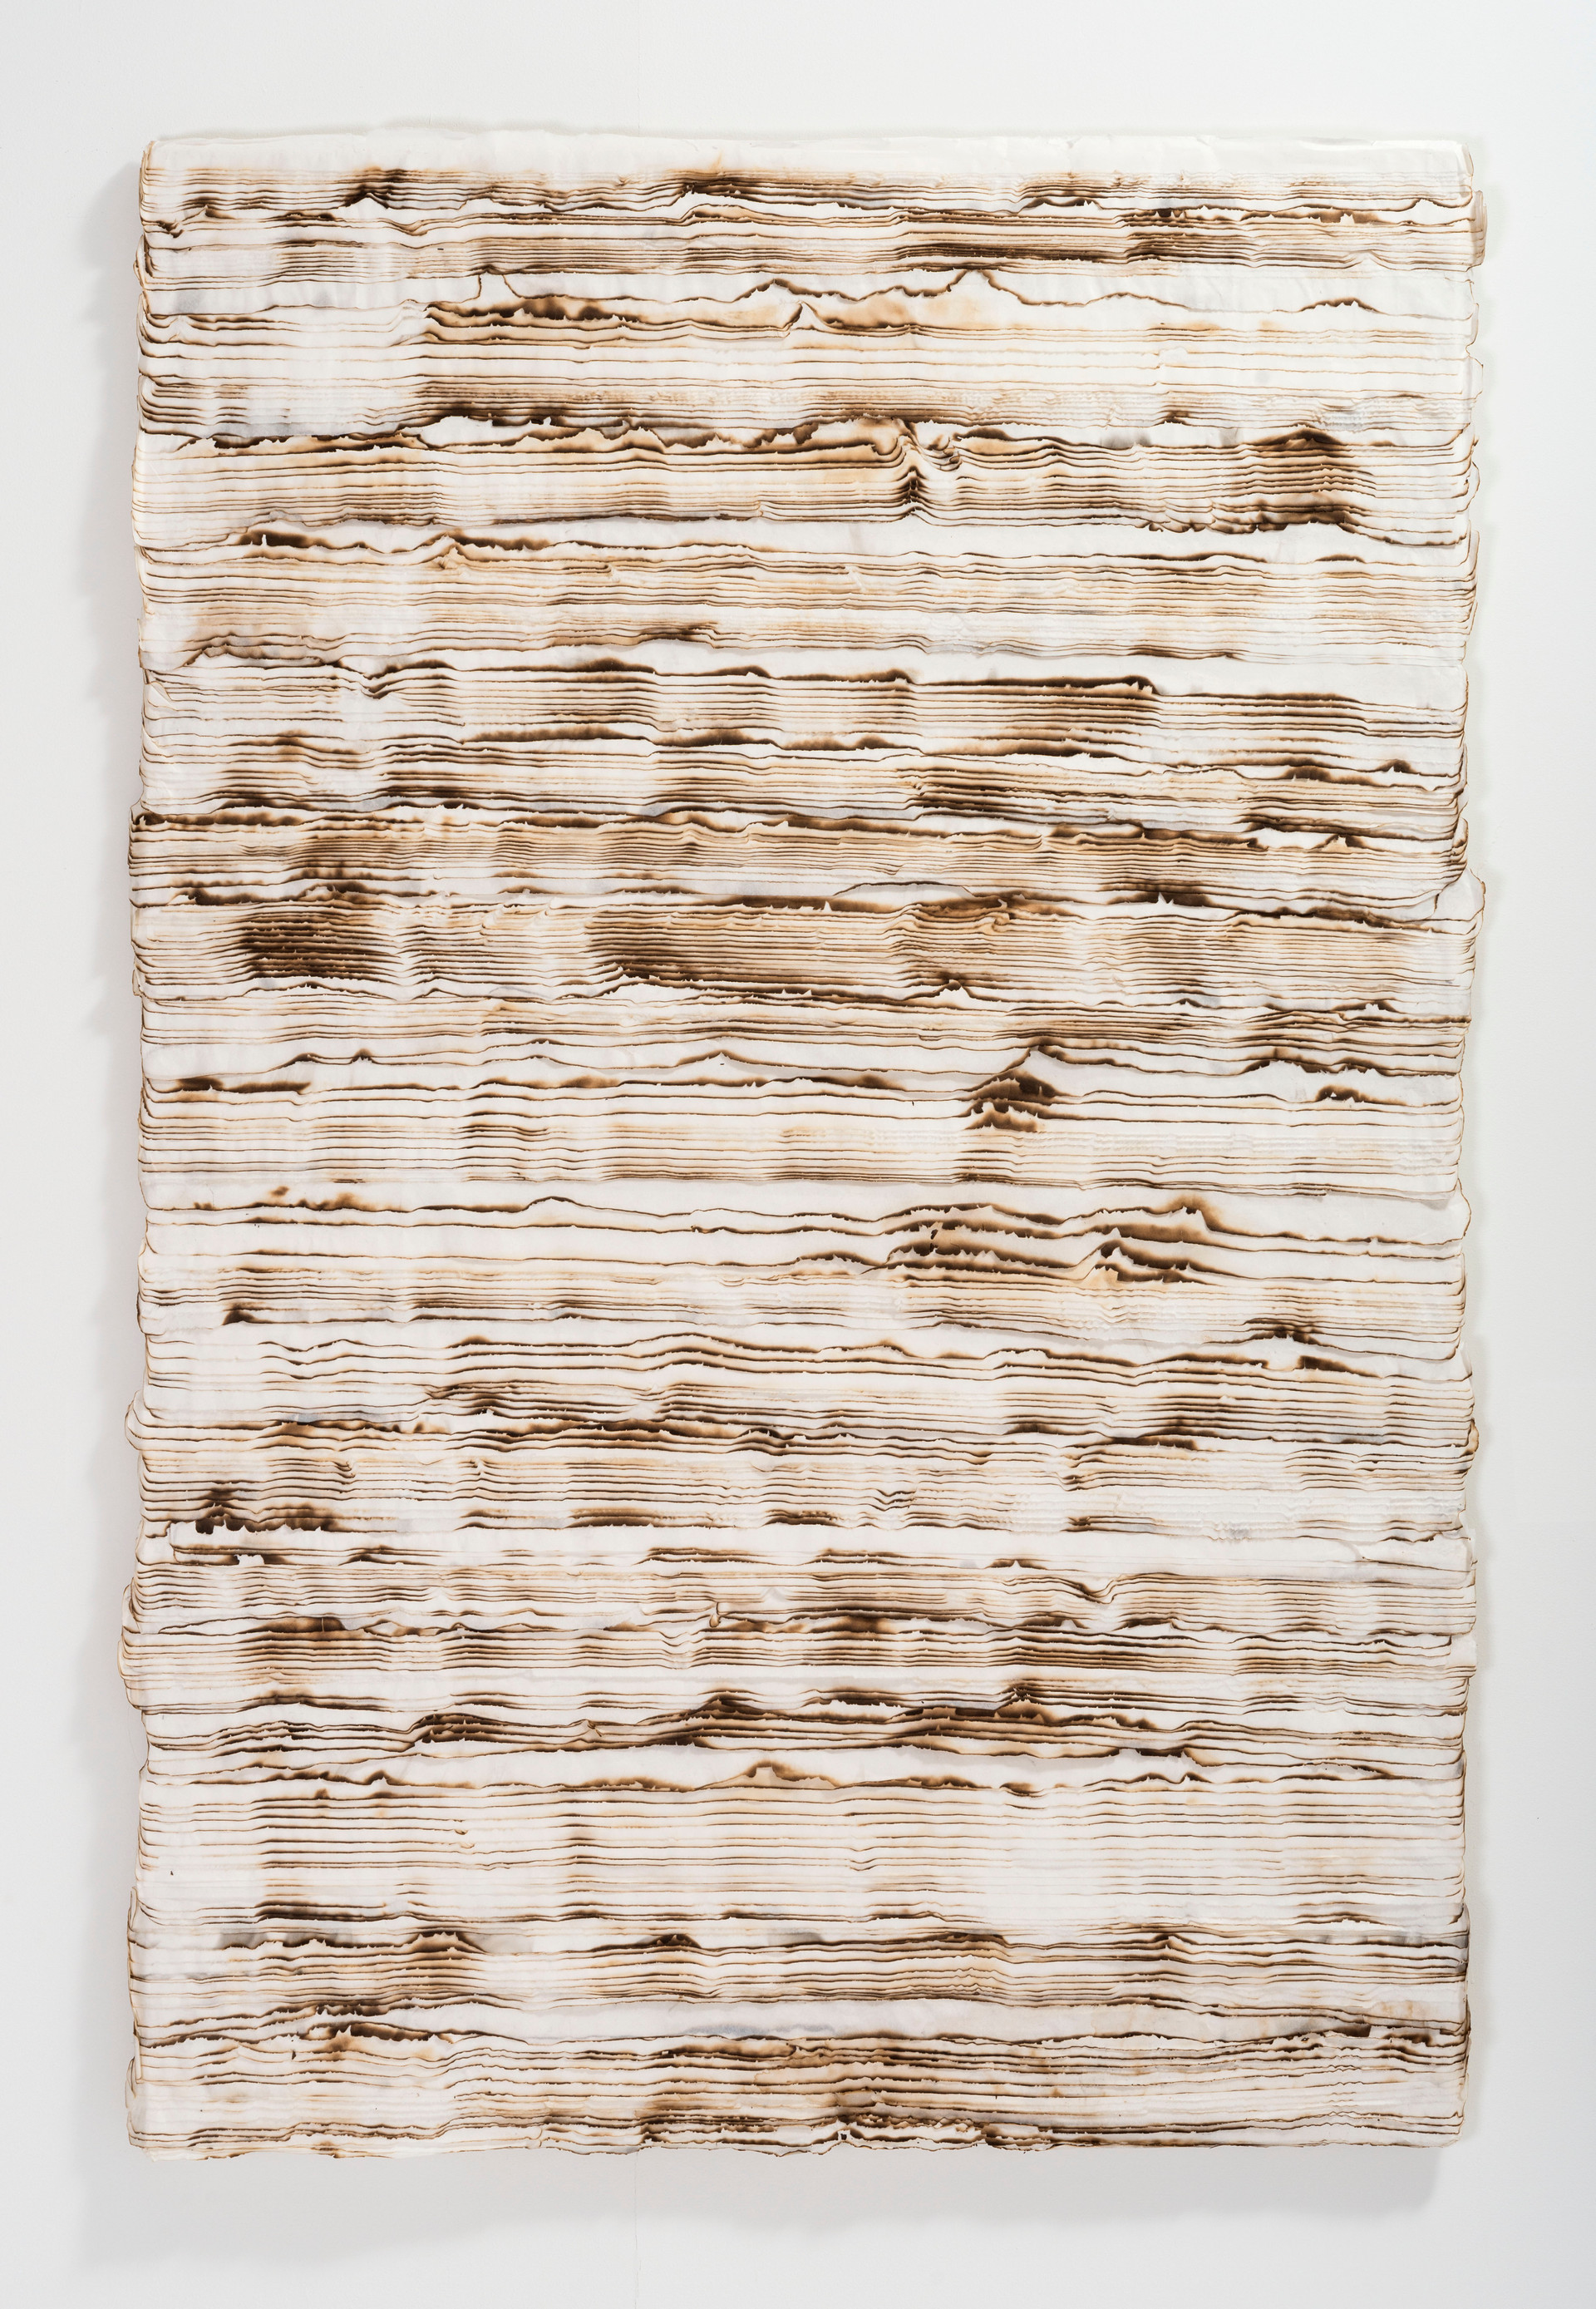 Combustion/2018/Hanji paper/155x105 cm